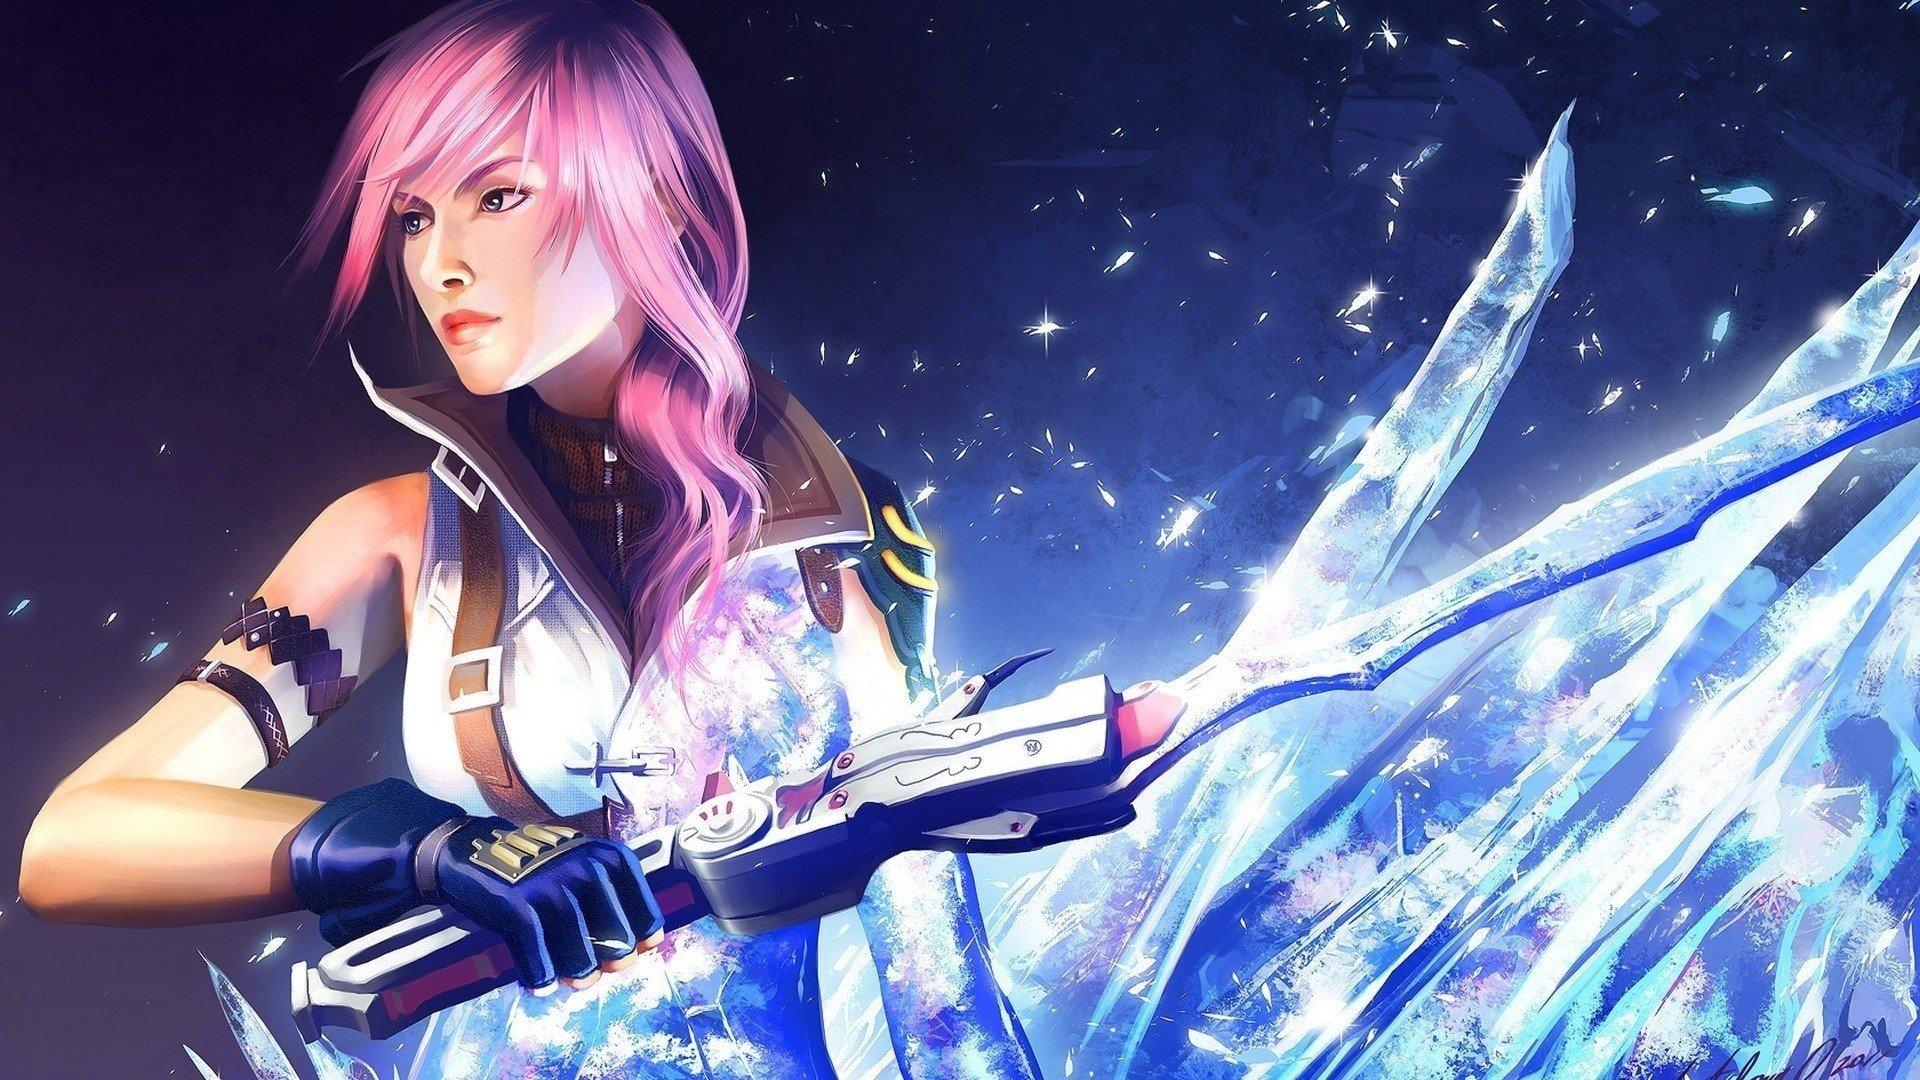 Final Fantasy XIII, Claire Farron, Video games Wallpaper